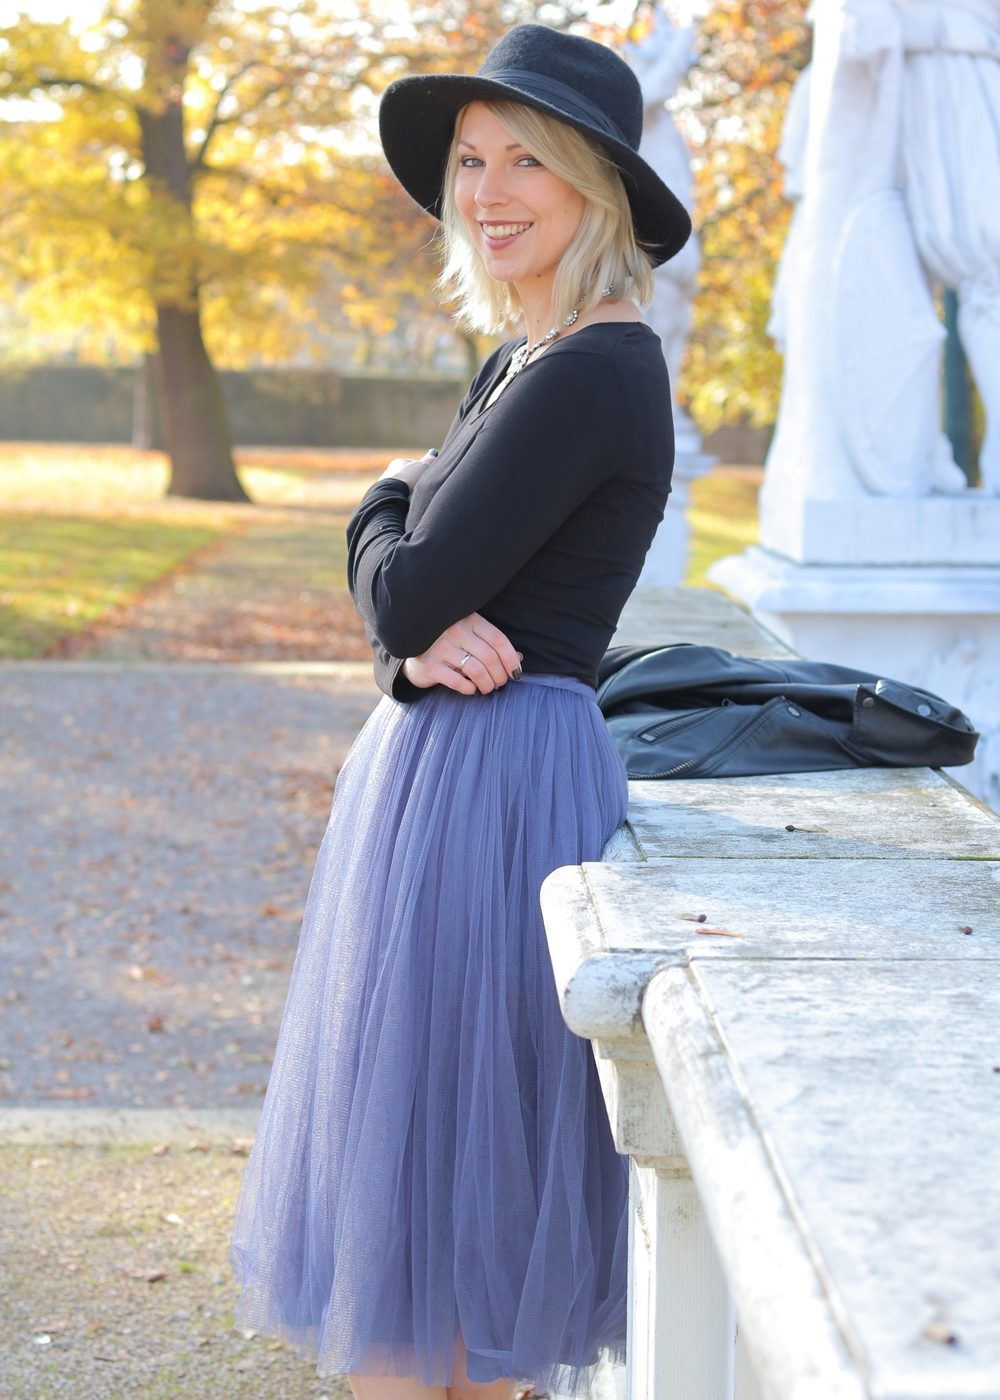 fashionblogger-karlsruhe-outfit-lila-tuellrock-asos-shirt-pumps-tamaris-schwarzer-hut-26